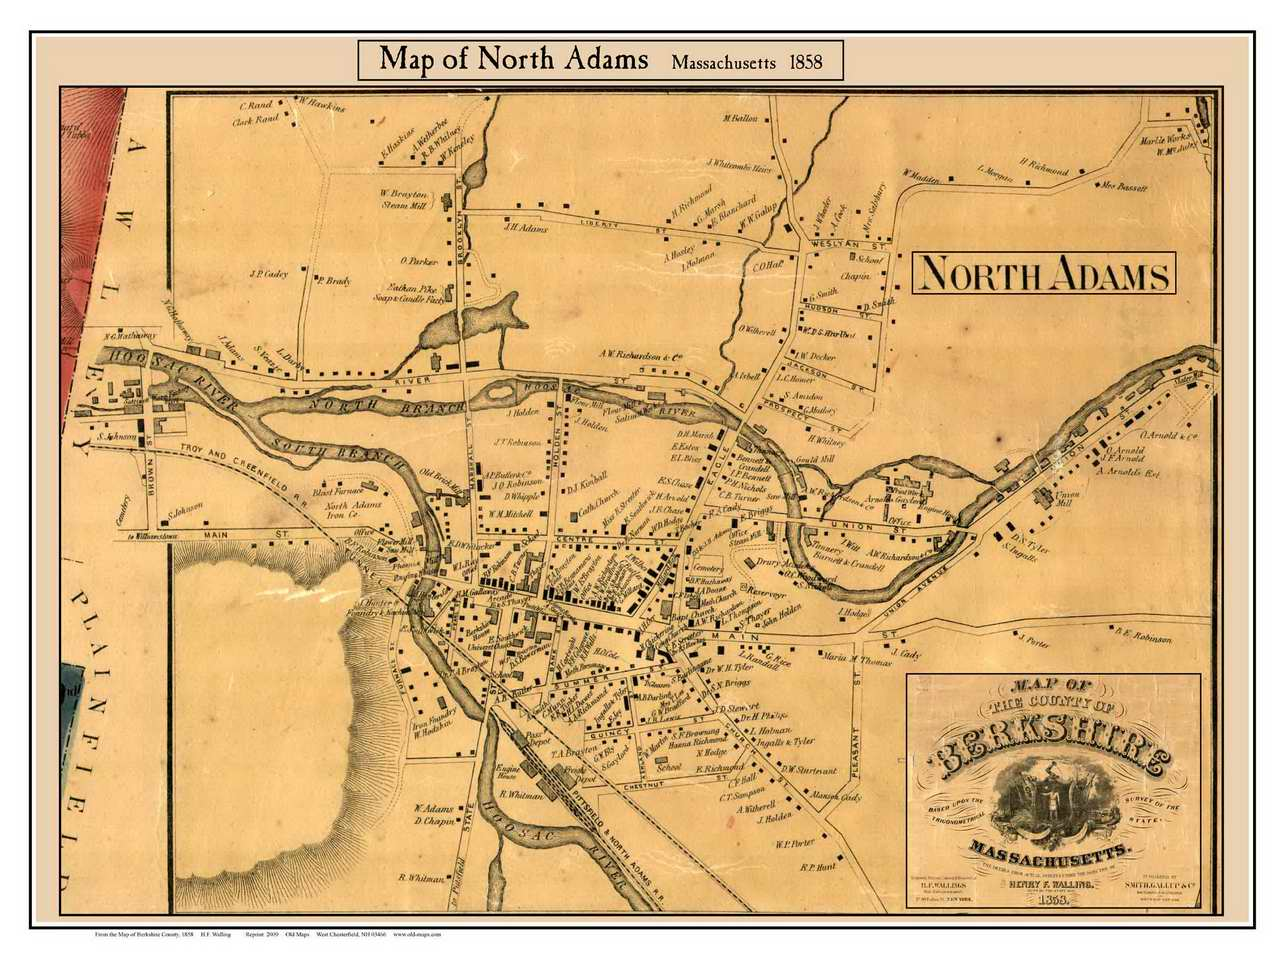 mt greylock trail map with Map Of North Adams Ma Things To Do Wsbxfom32wvj 7cskho5taulthndwaa76txmyjqacbmi5cedx 0z4f5urrpkpj4ecsparvjf7udssj6puxomp00a on Castle Trail besides Ashuwillticook Rail Trail additionally Mt Greylock Massachusetts further 22224290 further File AppalachianLocatorMap2.